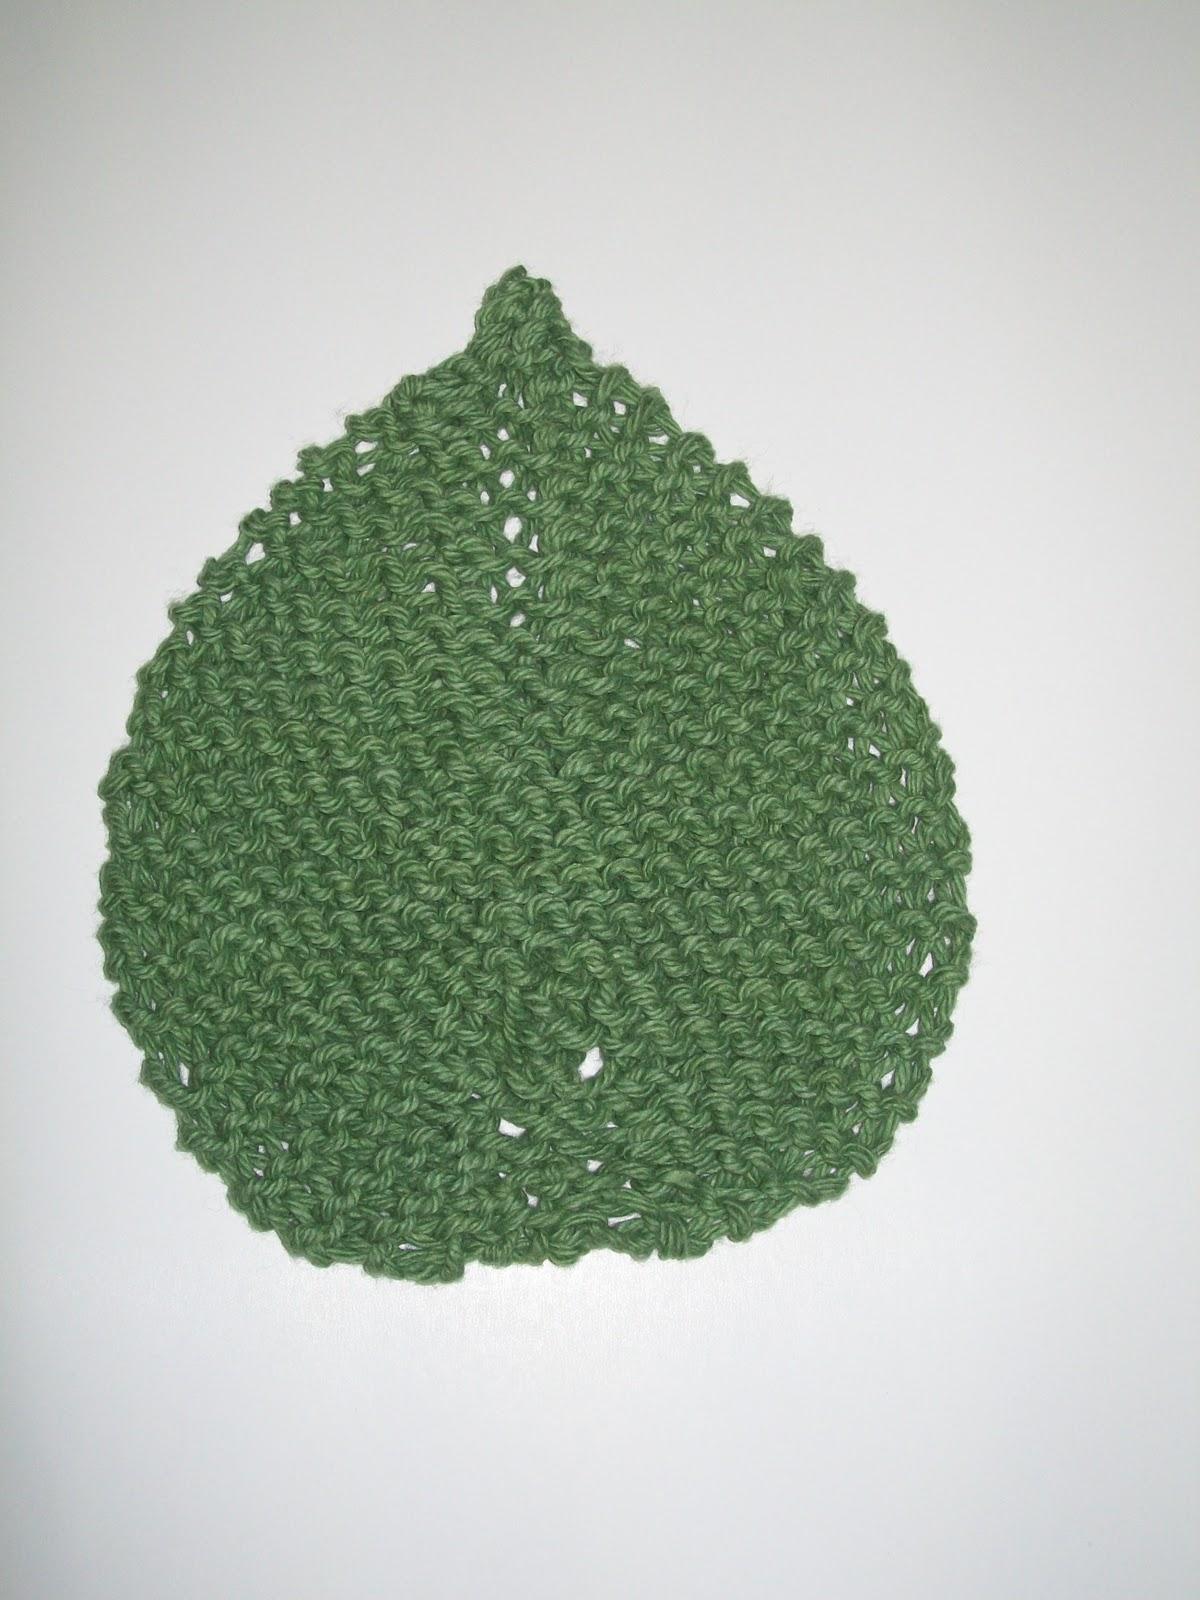 Crafts by Cori: Leaf Pattern Knitted Dishcloth (PC Avocado) USD1.50